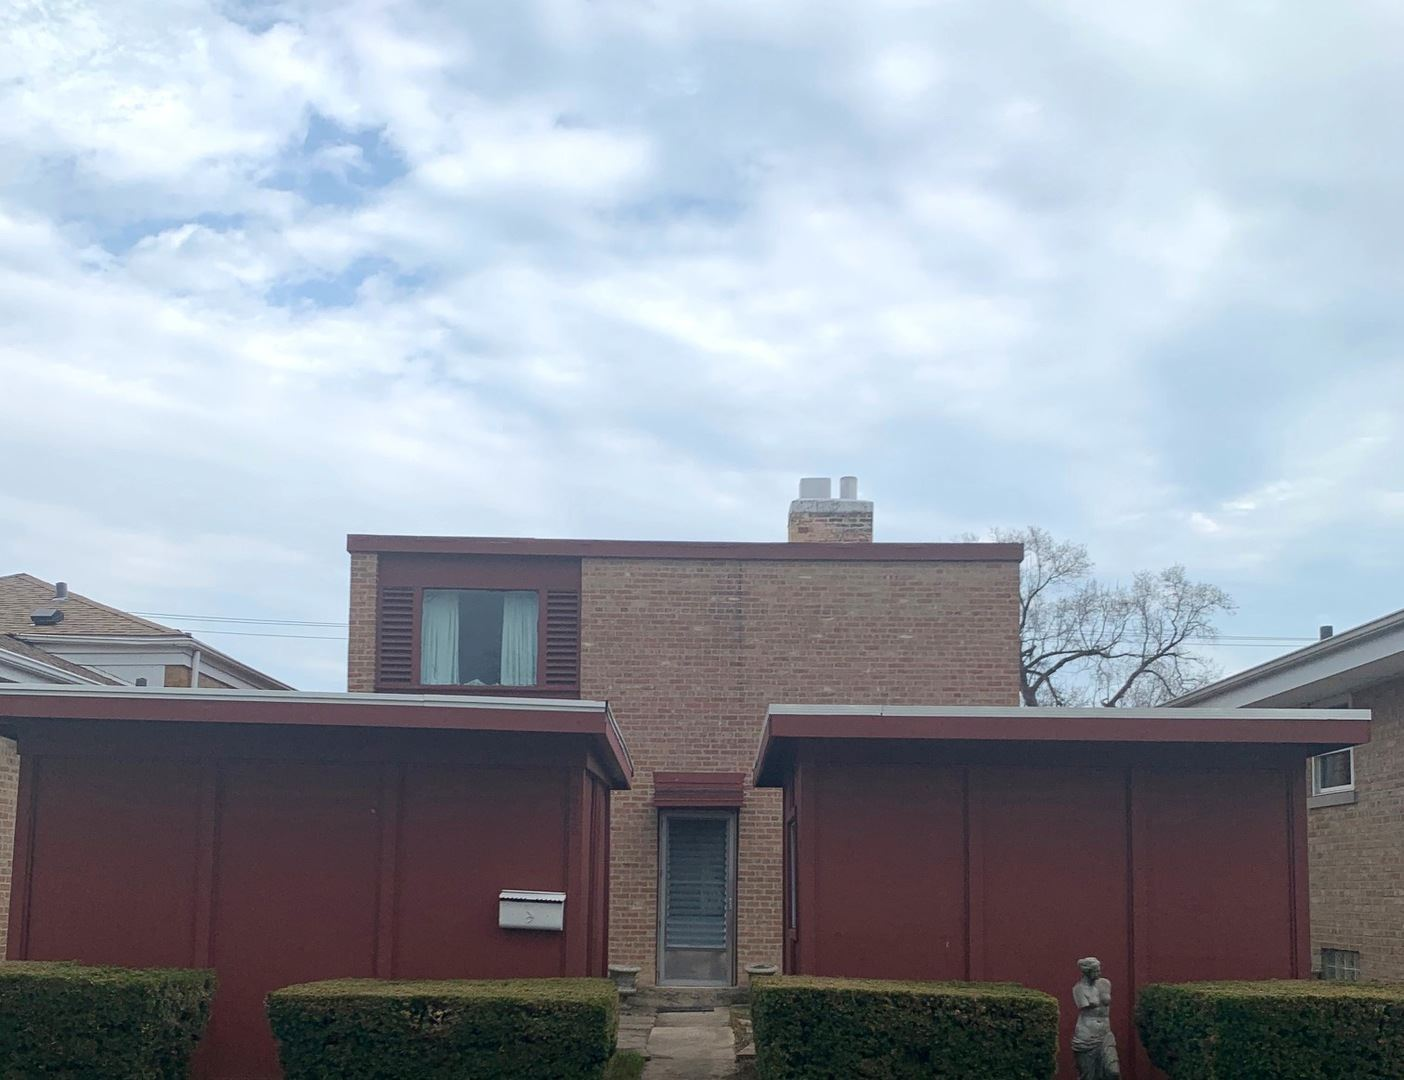 6245 N Harding Avenue, Chicago, IL 60659 - #: 10688948